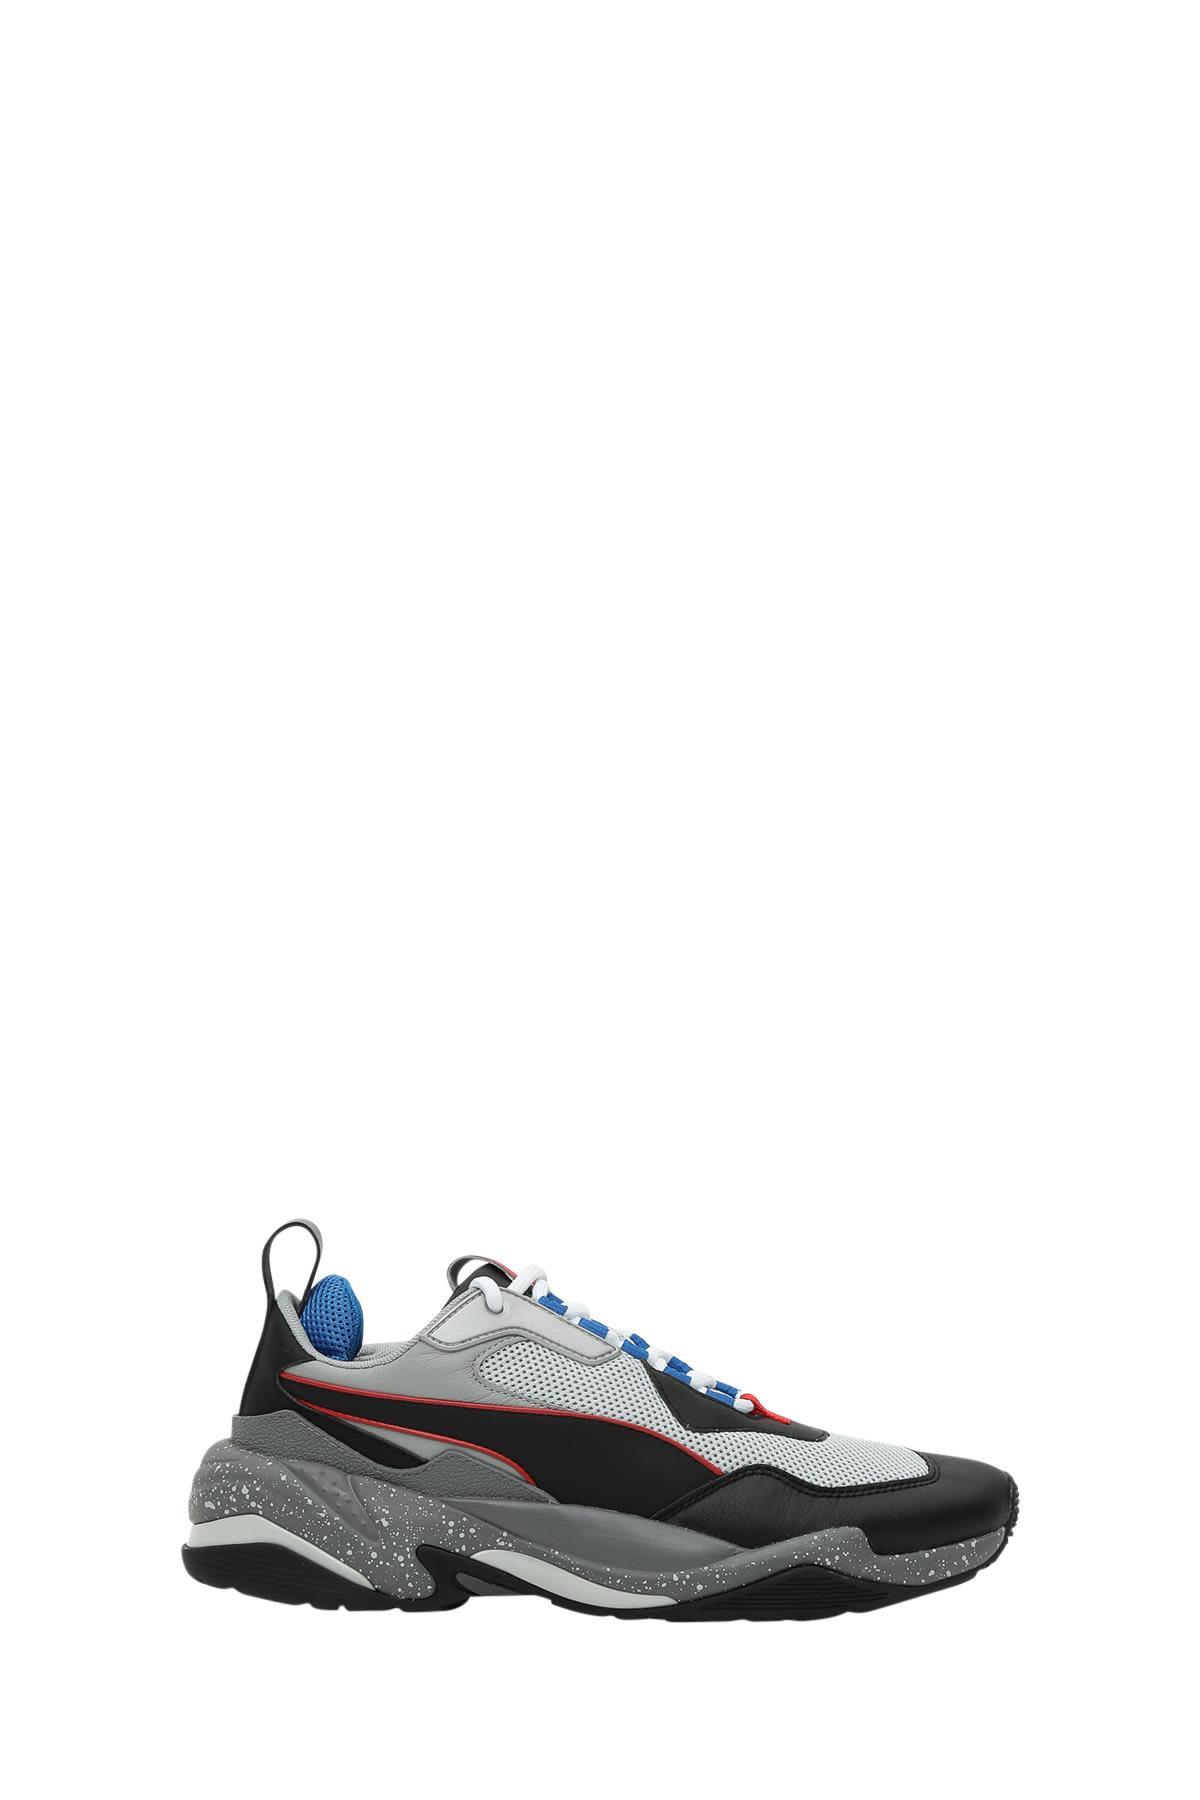 puma -  Low-top Sneaker